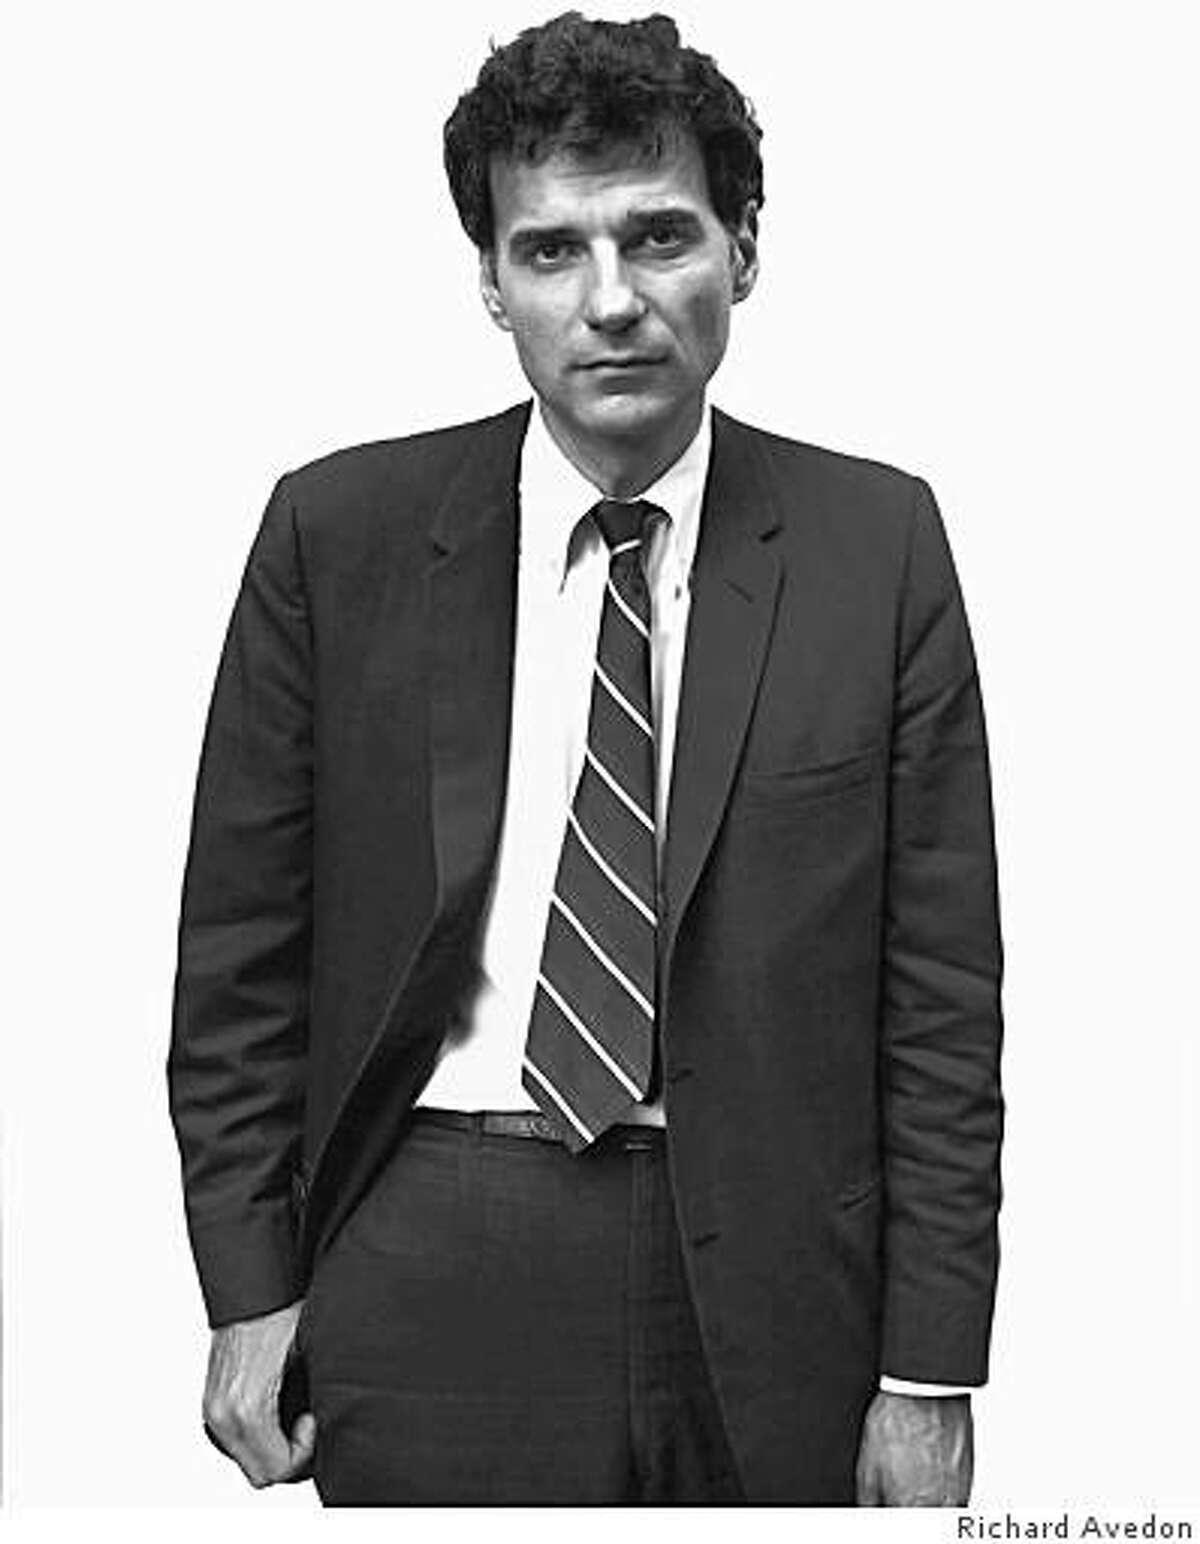 Ralph Nader, Consumer advocate, Washington, D.C.. Age: 42. copyright 2009 Richard Avedon Foundation